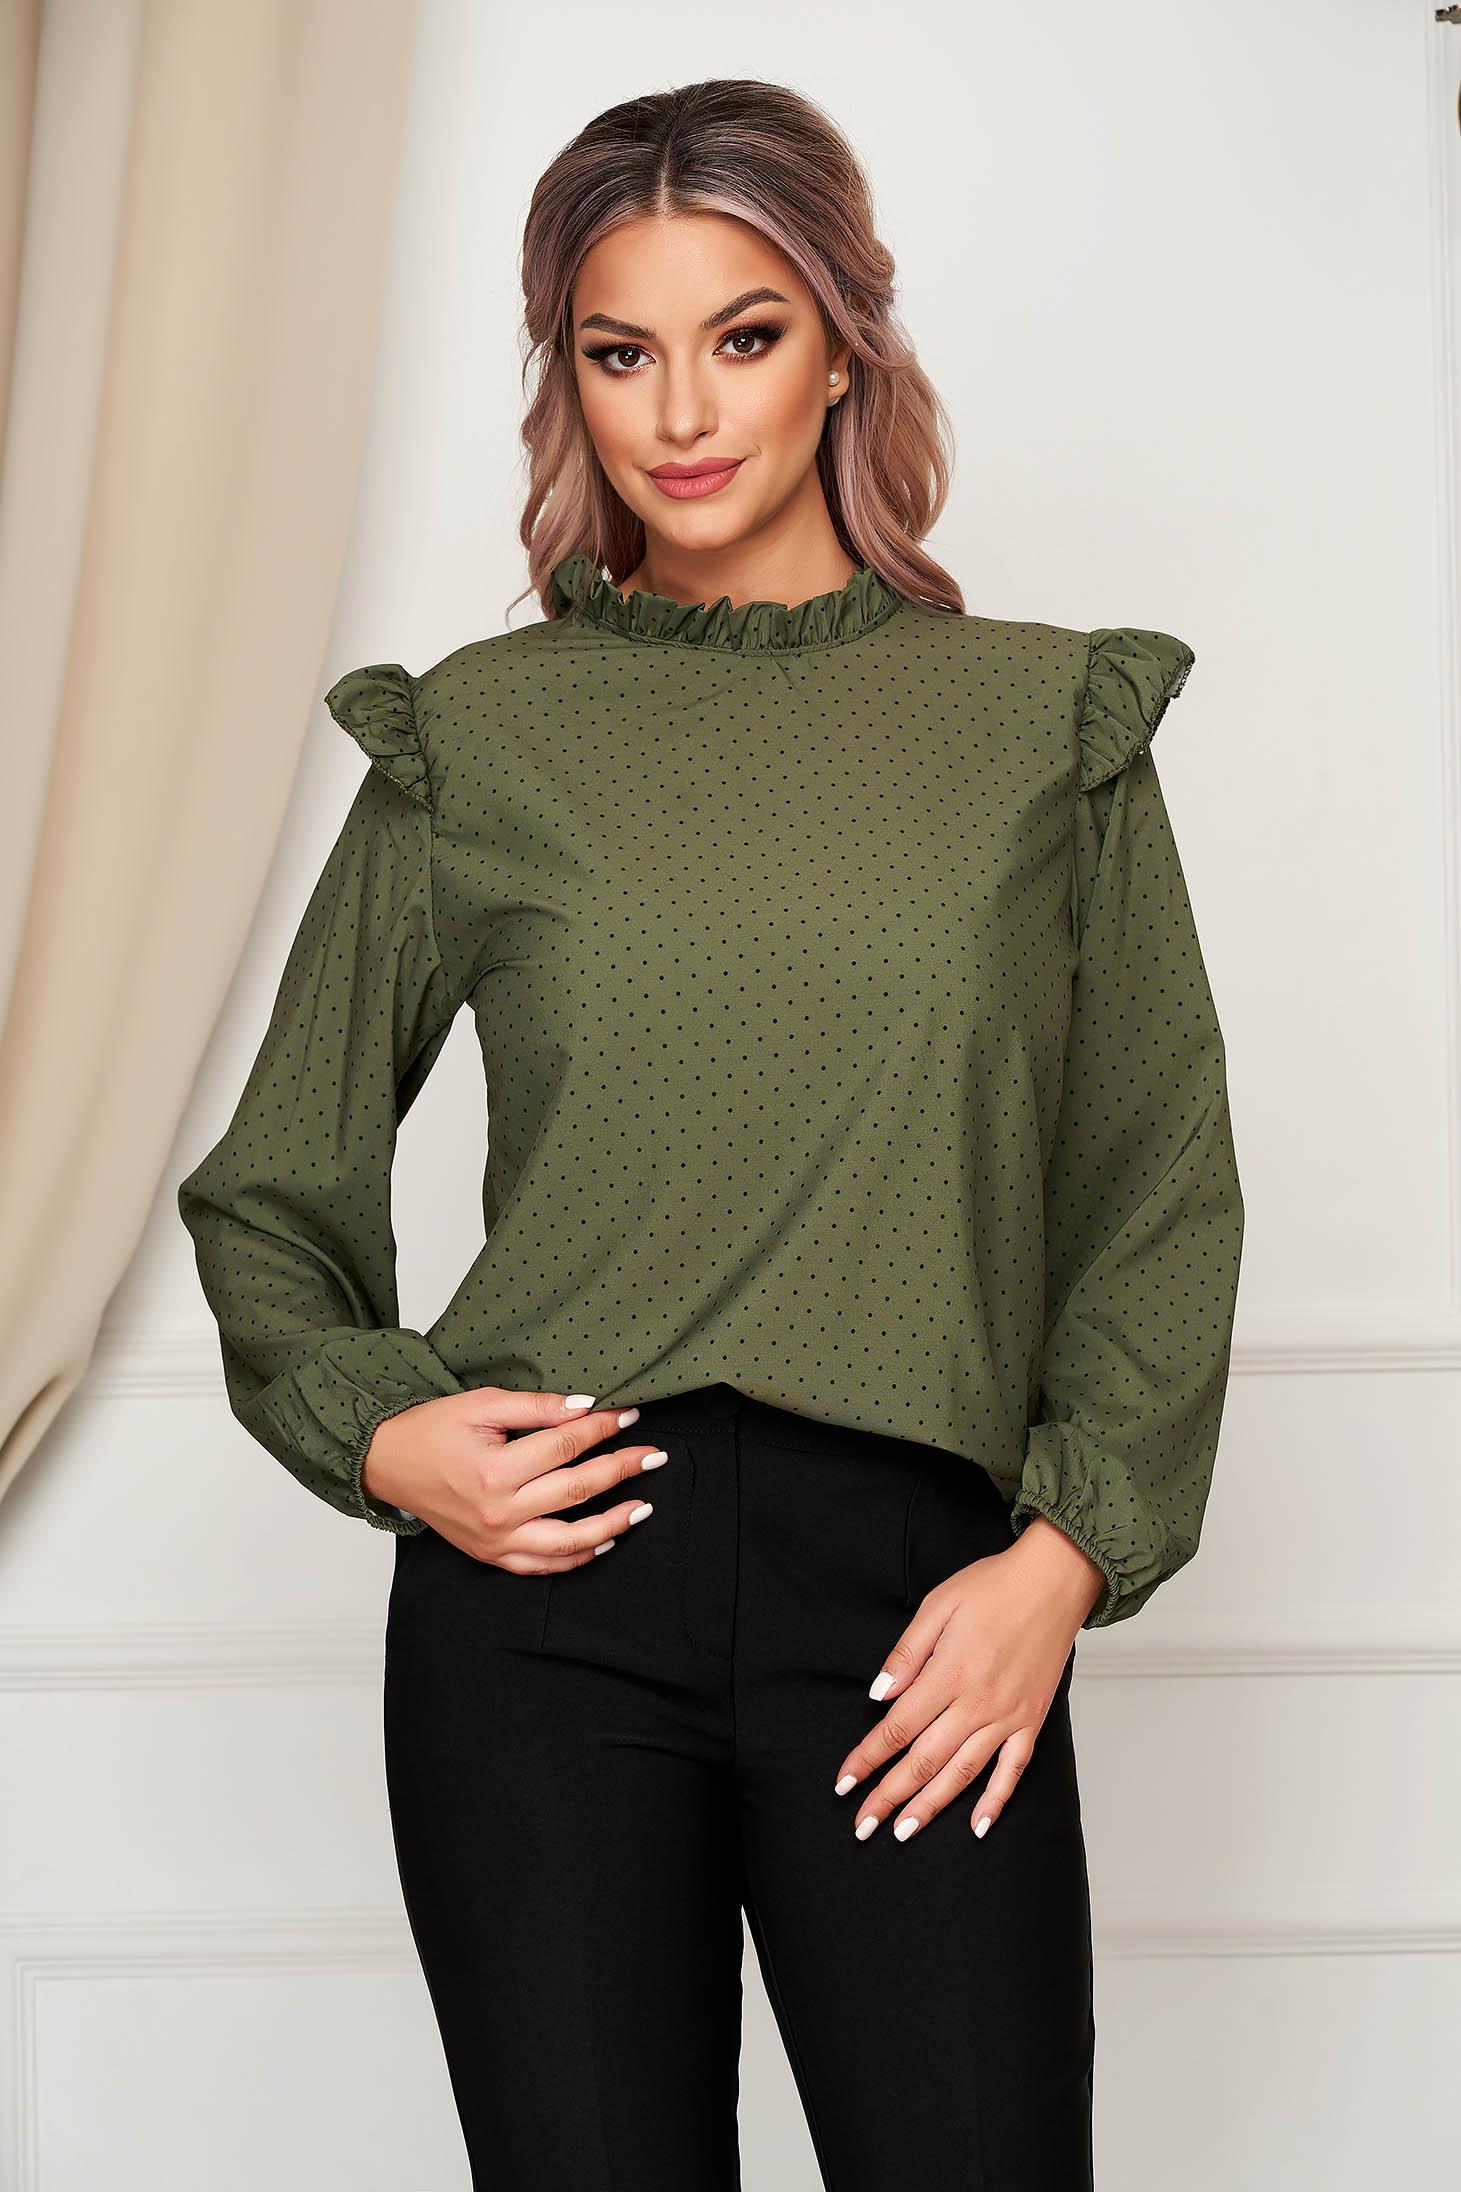 Bluza dama SunShine verde-inchis office cu croi larg din material subtire cu volanase si buline